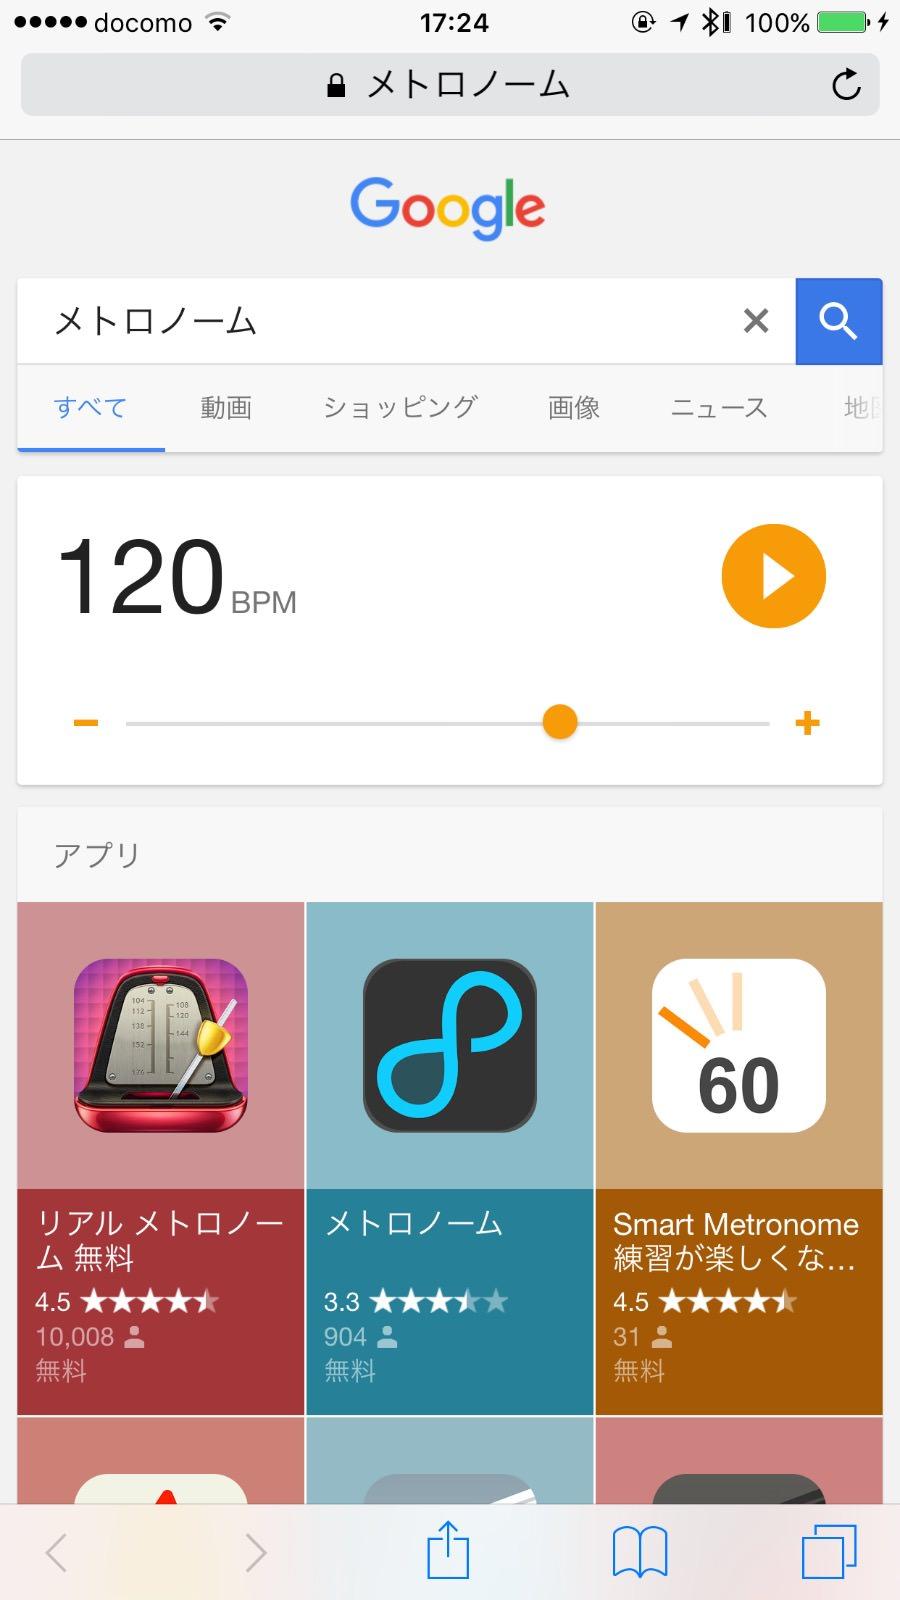 Google metronome 2338